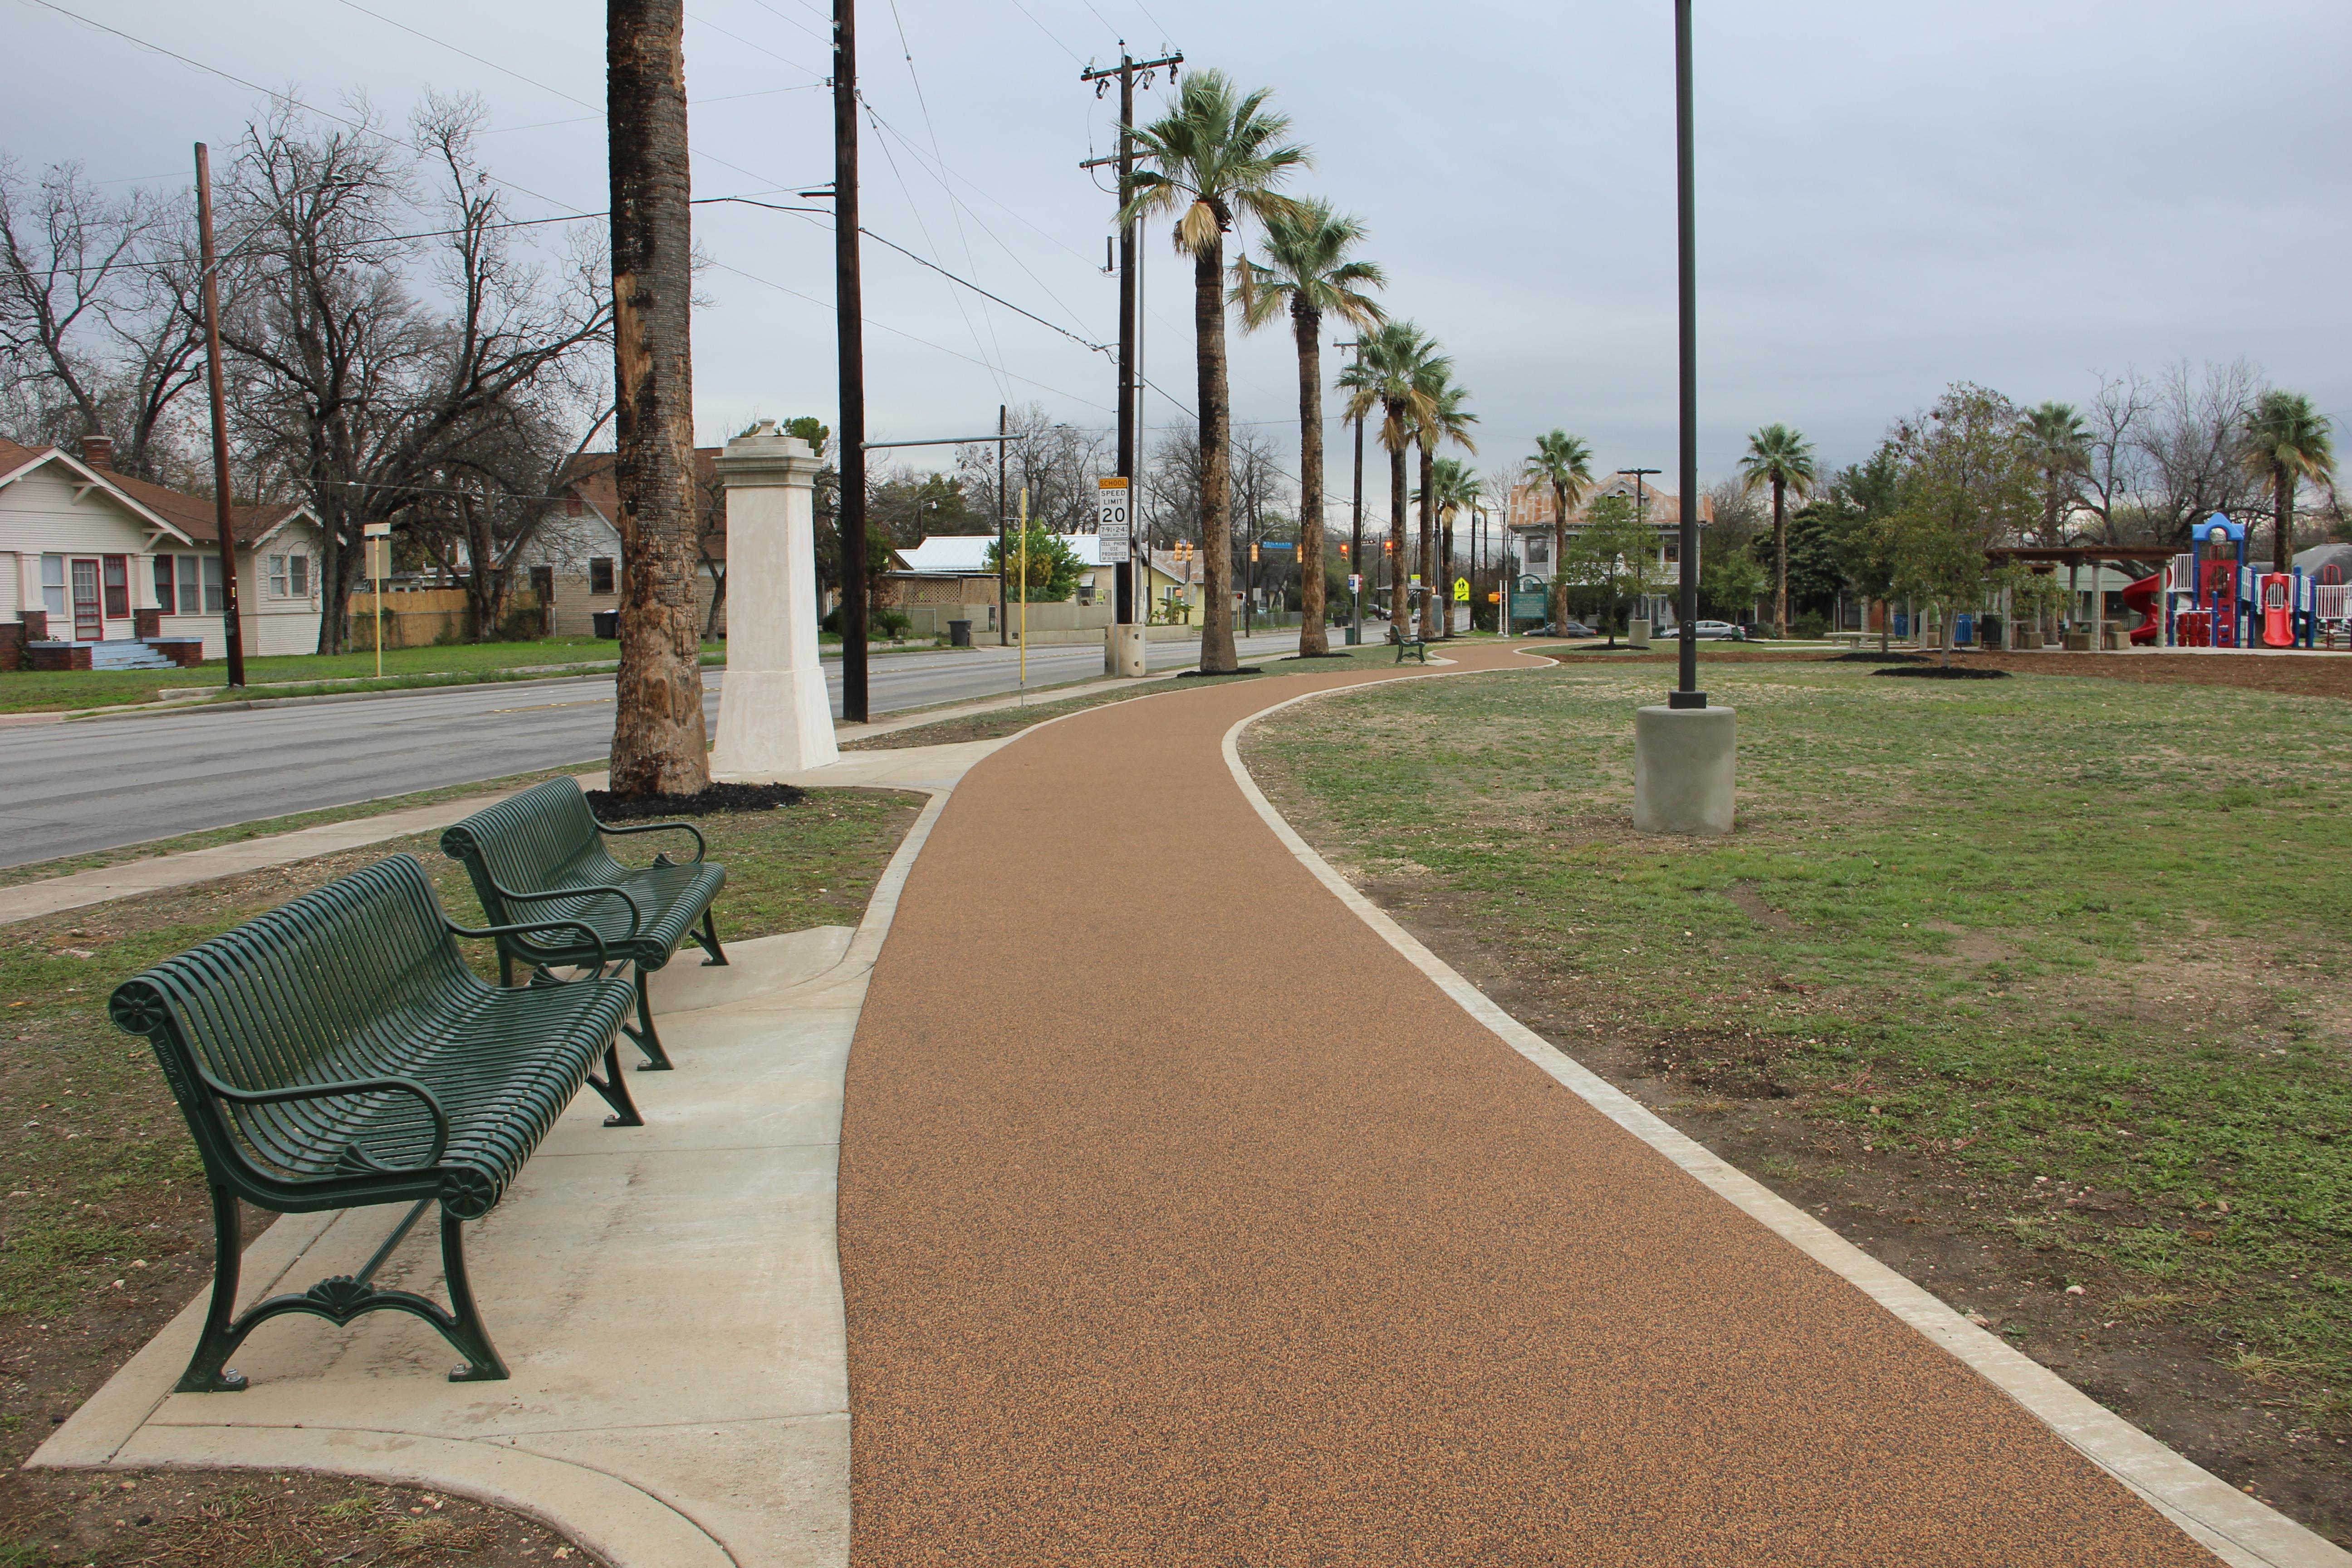 Pittman-Sullivan Park - The City of San Antonio - Official City Website